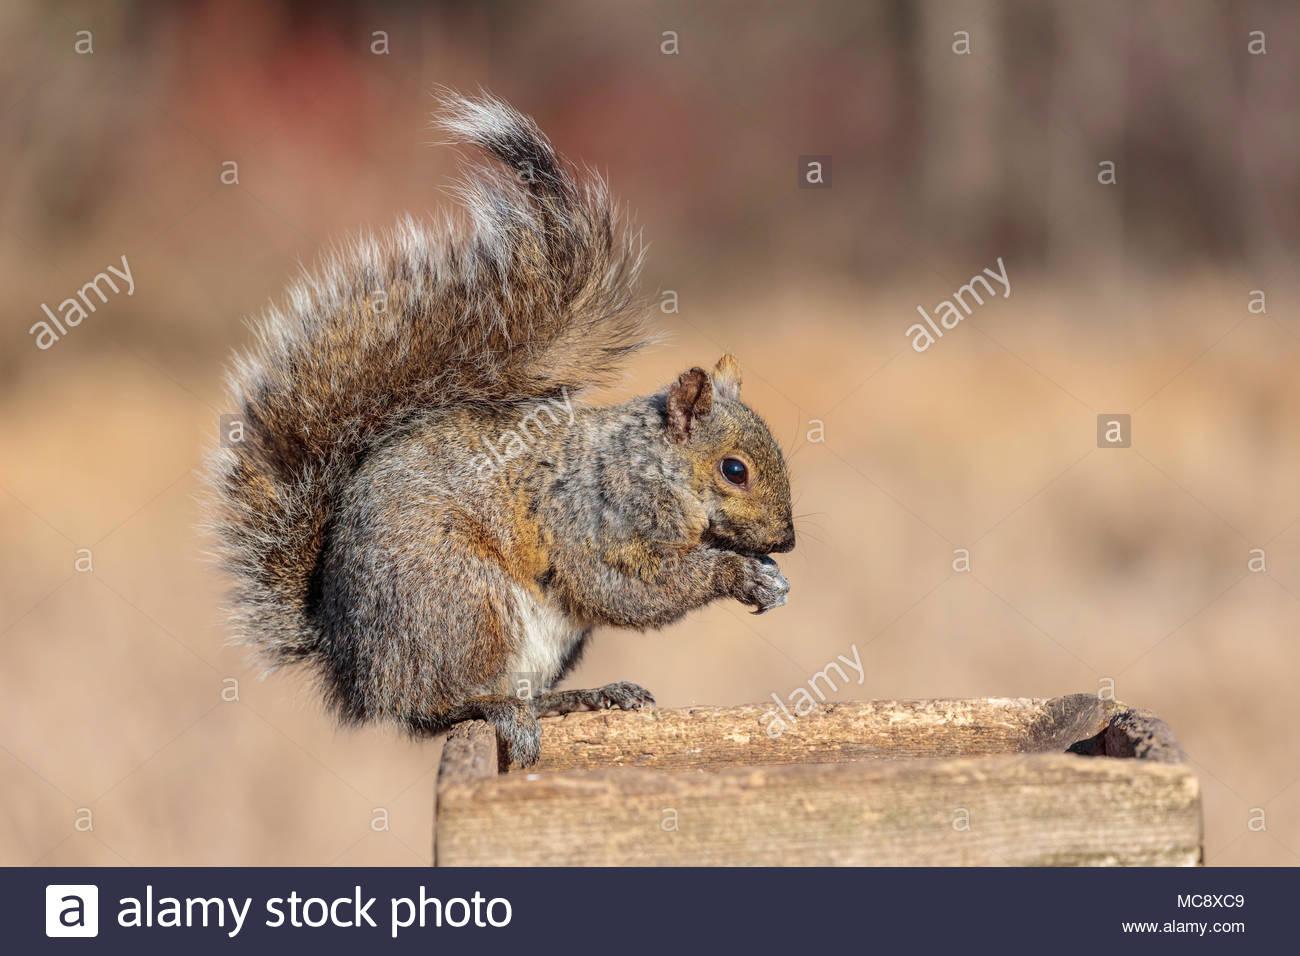 Sciurus carolinensis, eastern gray squirrel or eastern grey squirrel on bird feeder - Stock Image